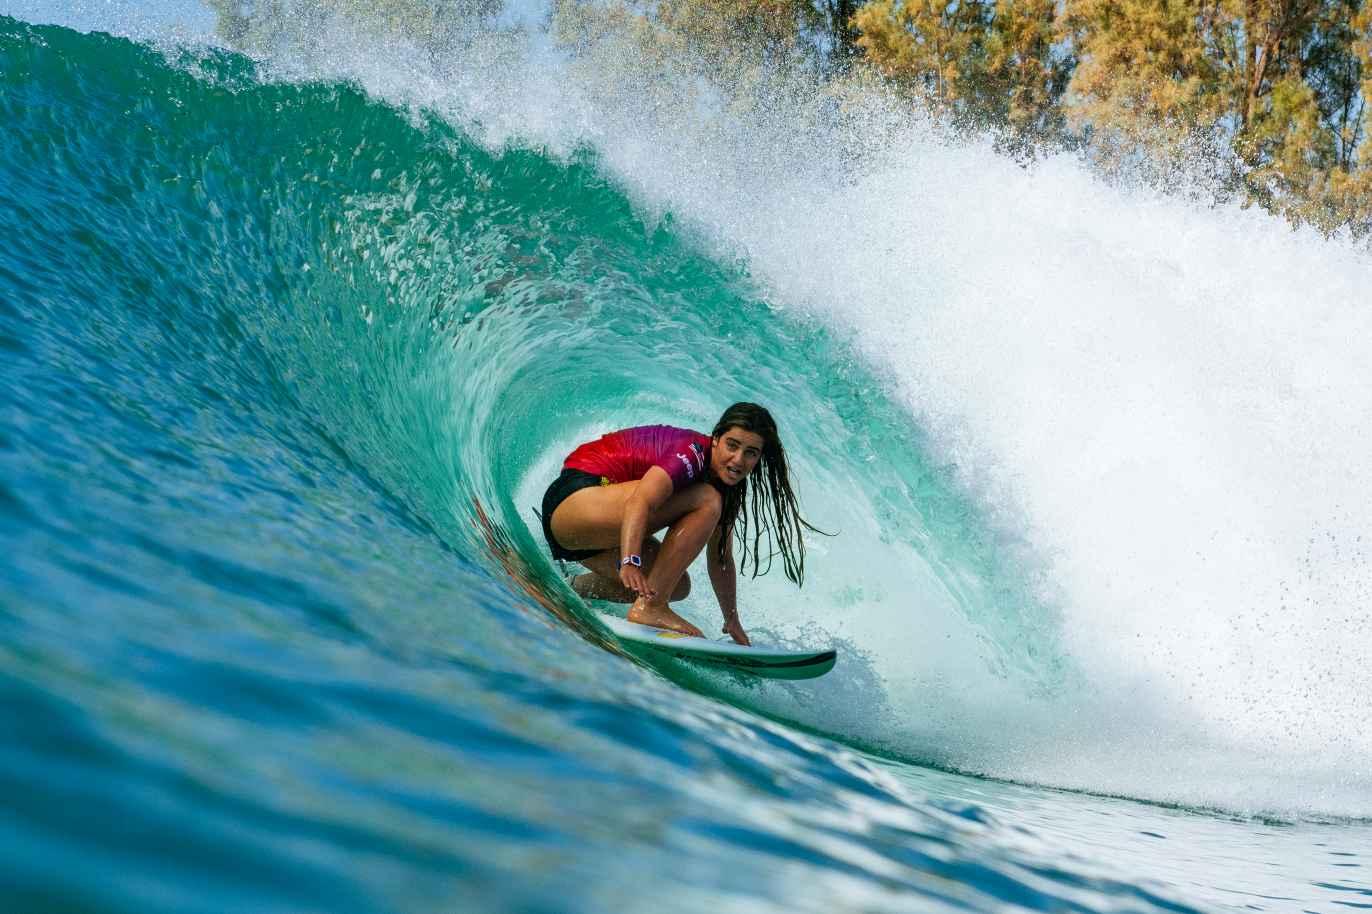 surf30 surf ranch pro 2021 wsl surf Marks C Ranch21 PNN 1882